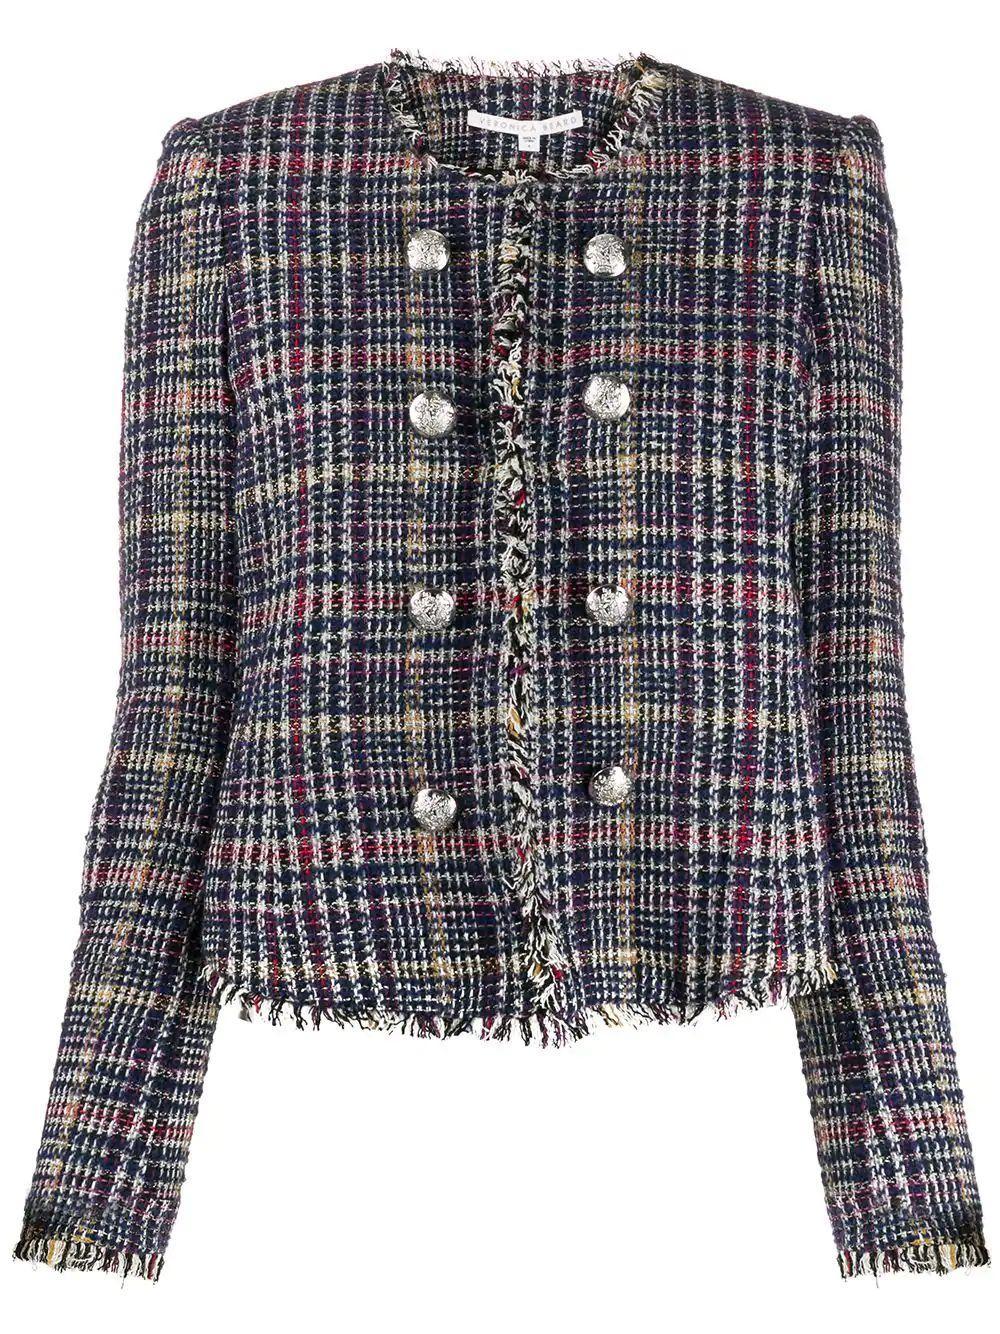 Jerry Tweed Jacket